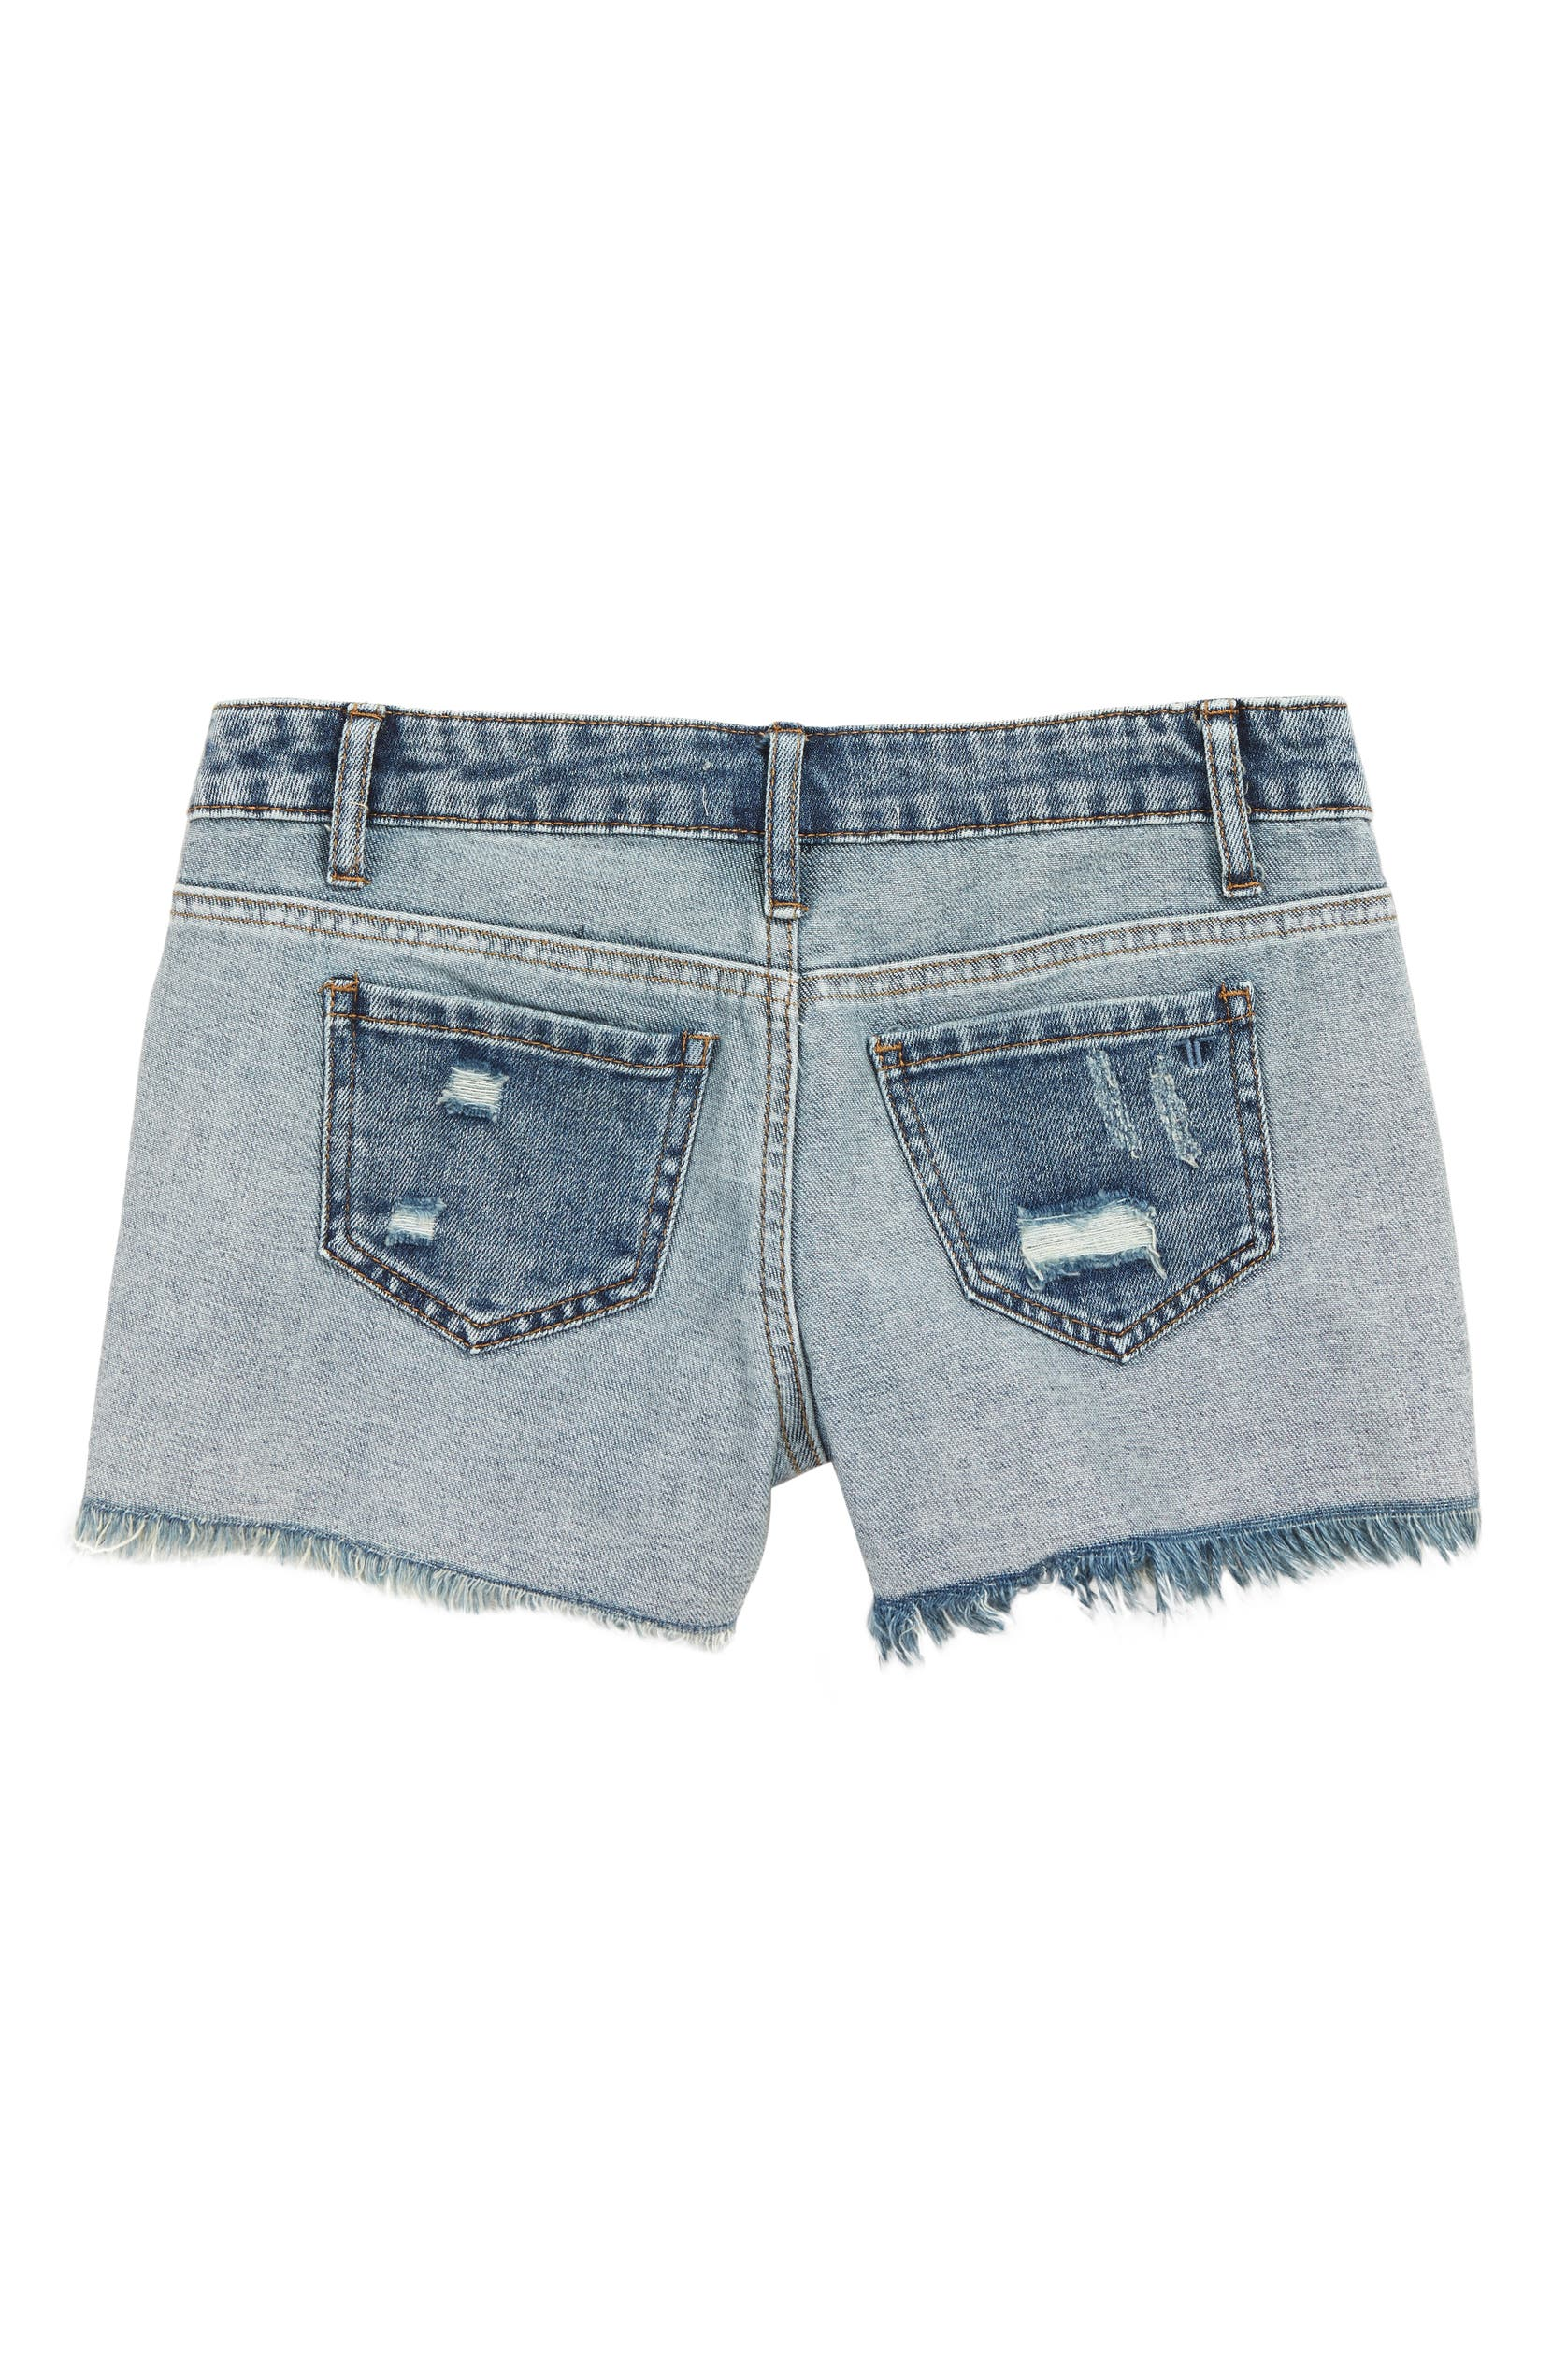 095081082d56c Tractr Frayed Denim Shorts (Big Girls) | Nordstrom